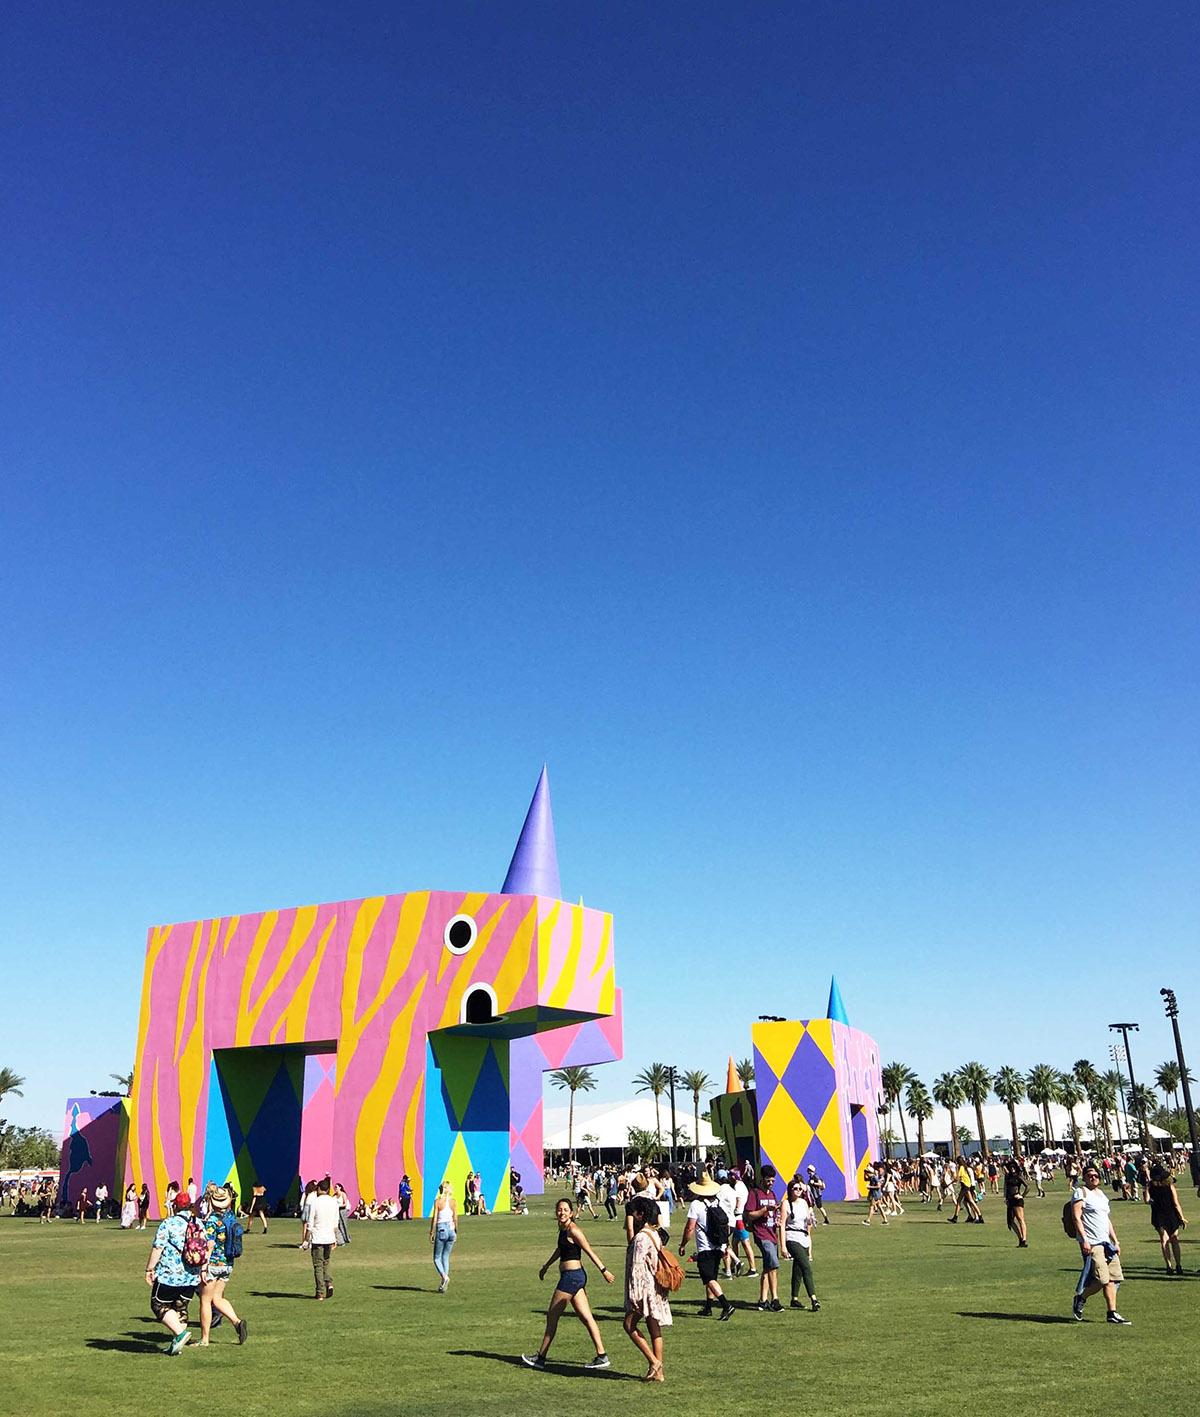 Coachella Valley Music and Art Festival 2017